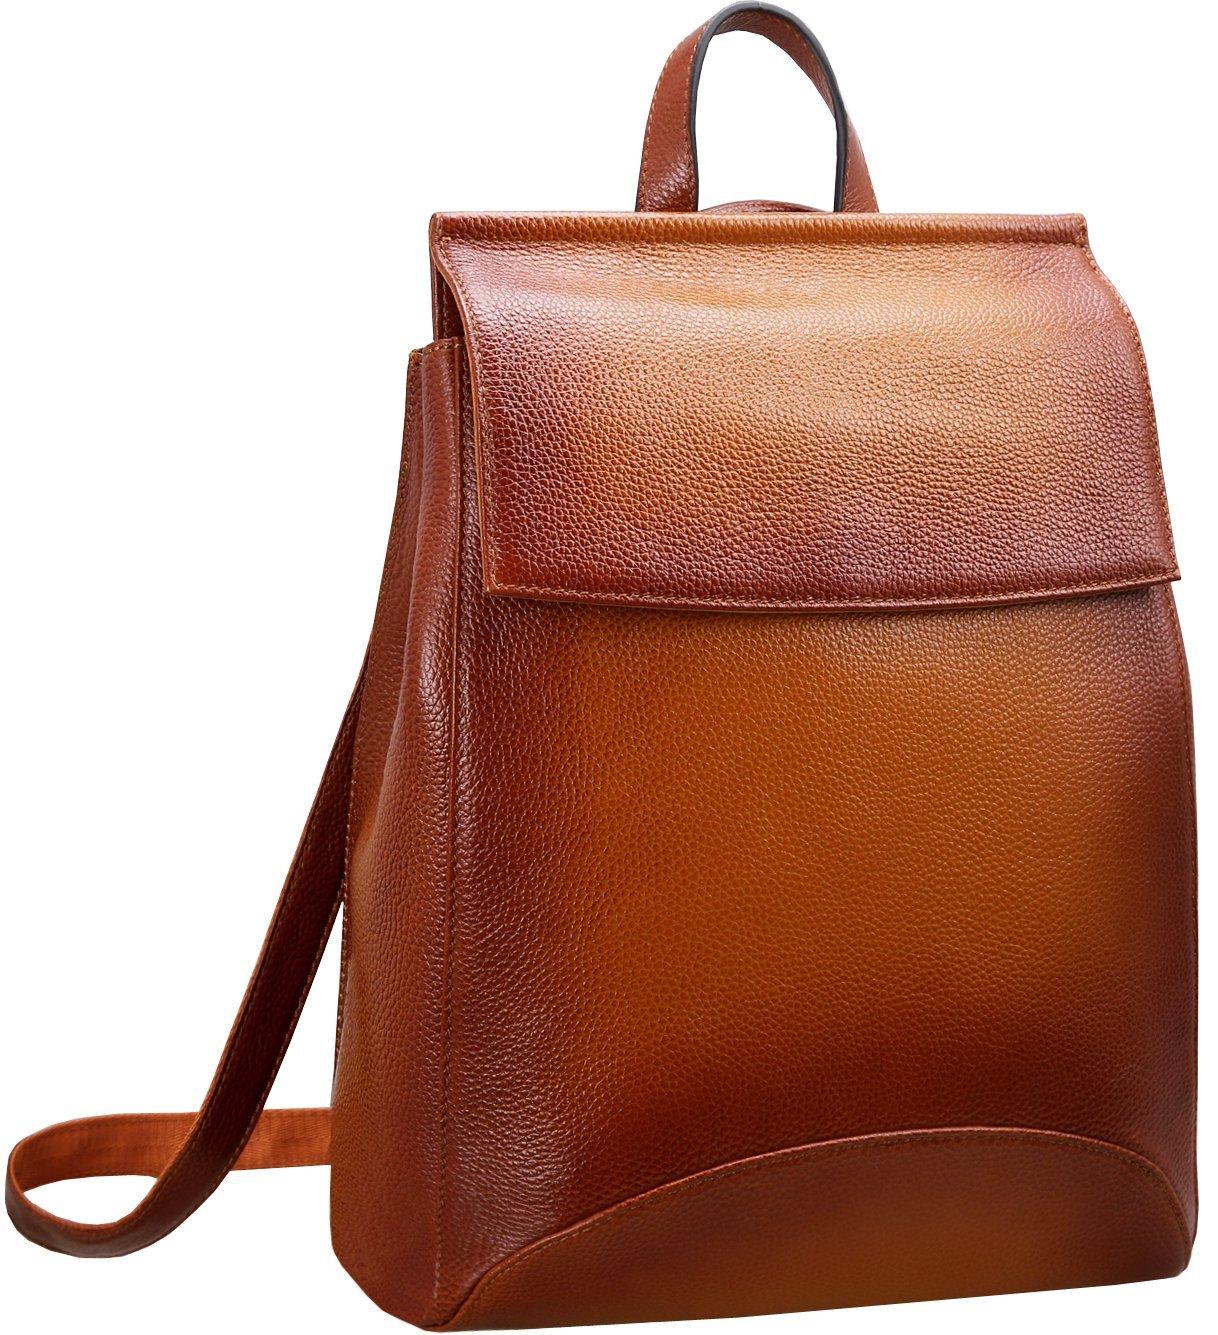 abc8ba5cbfd4a Amazon.com  Heshe Womens Leather Backpack Casual Style Flap Backpacks  Daypack for Ladies (Sorrel)  HESHE